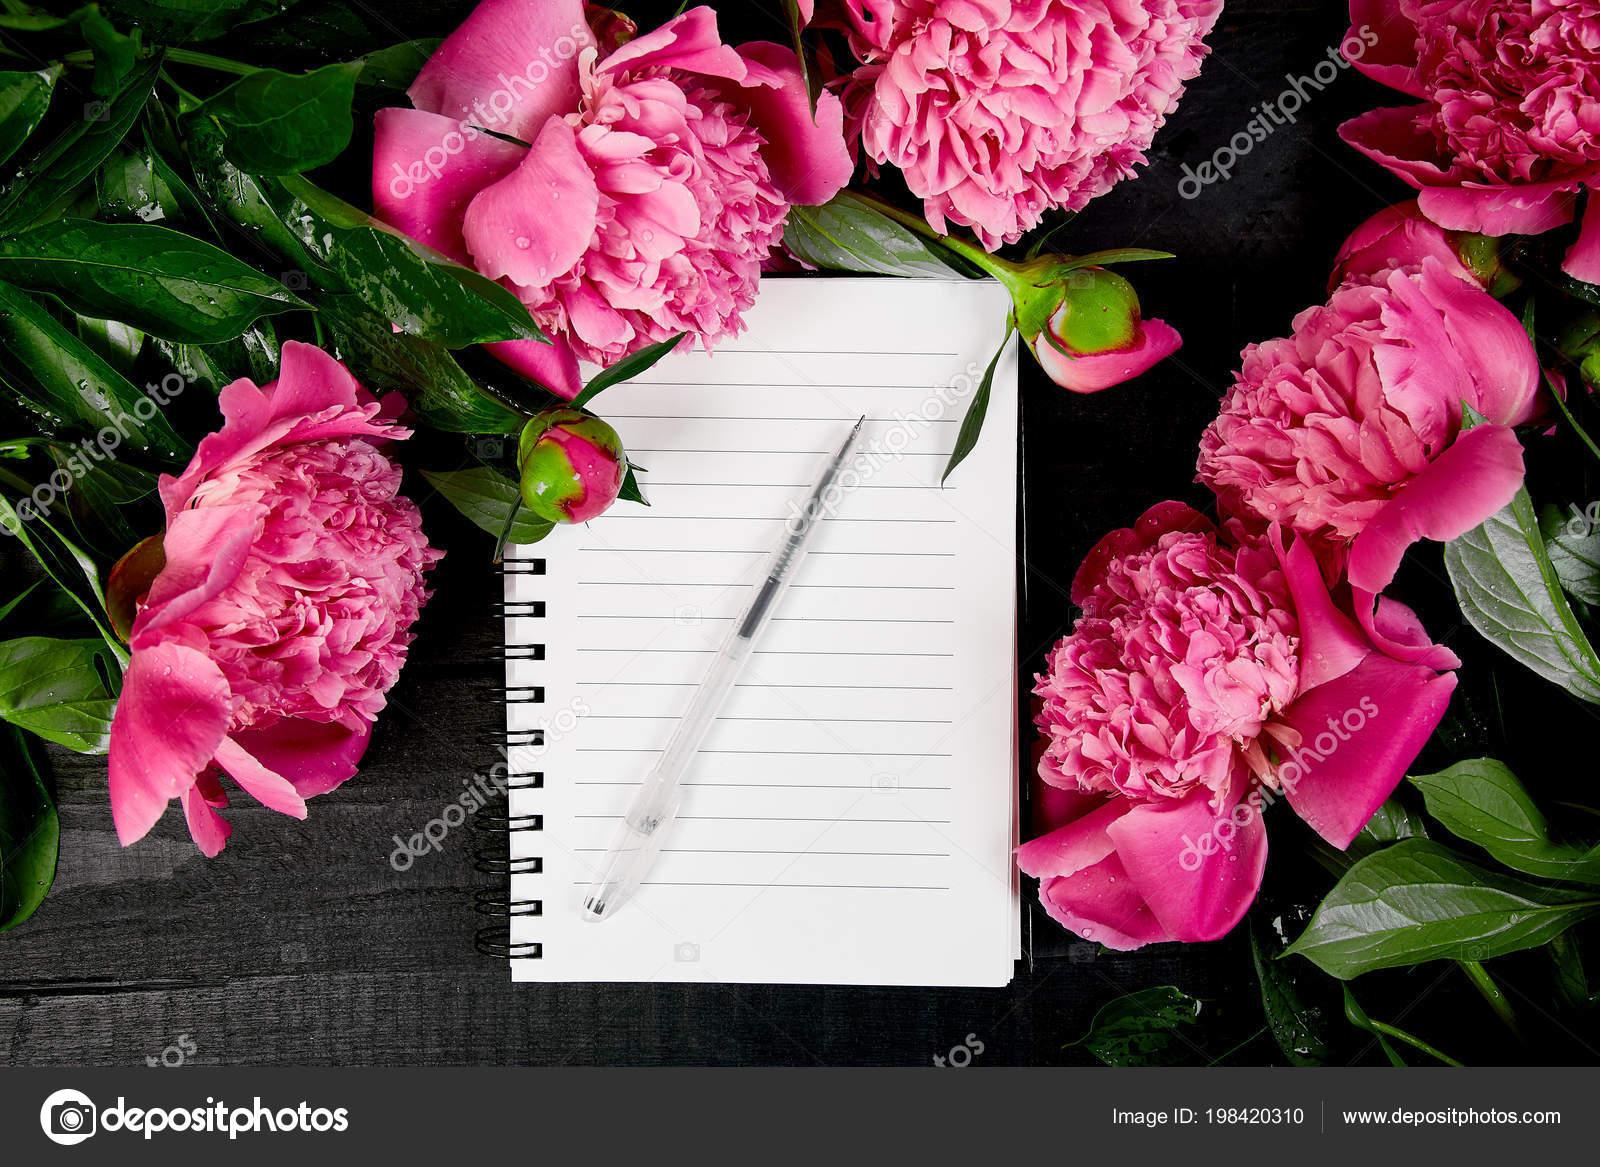 Beautiful pink peony flowers black background note diary planing beautiful pink peony flowers black background note diary planing list stock photo mightylinksfo